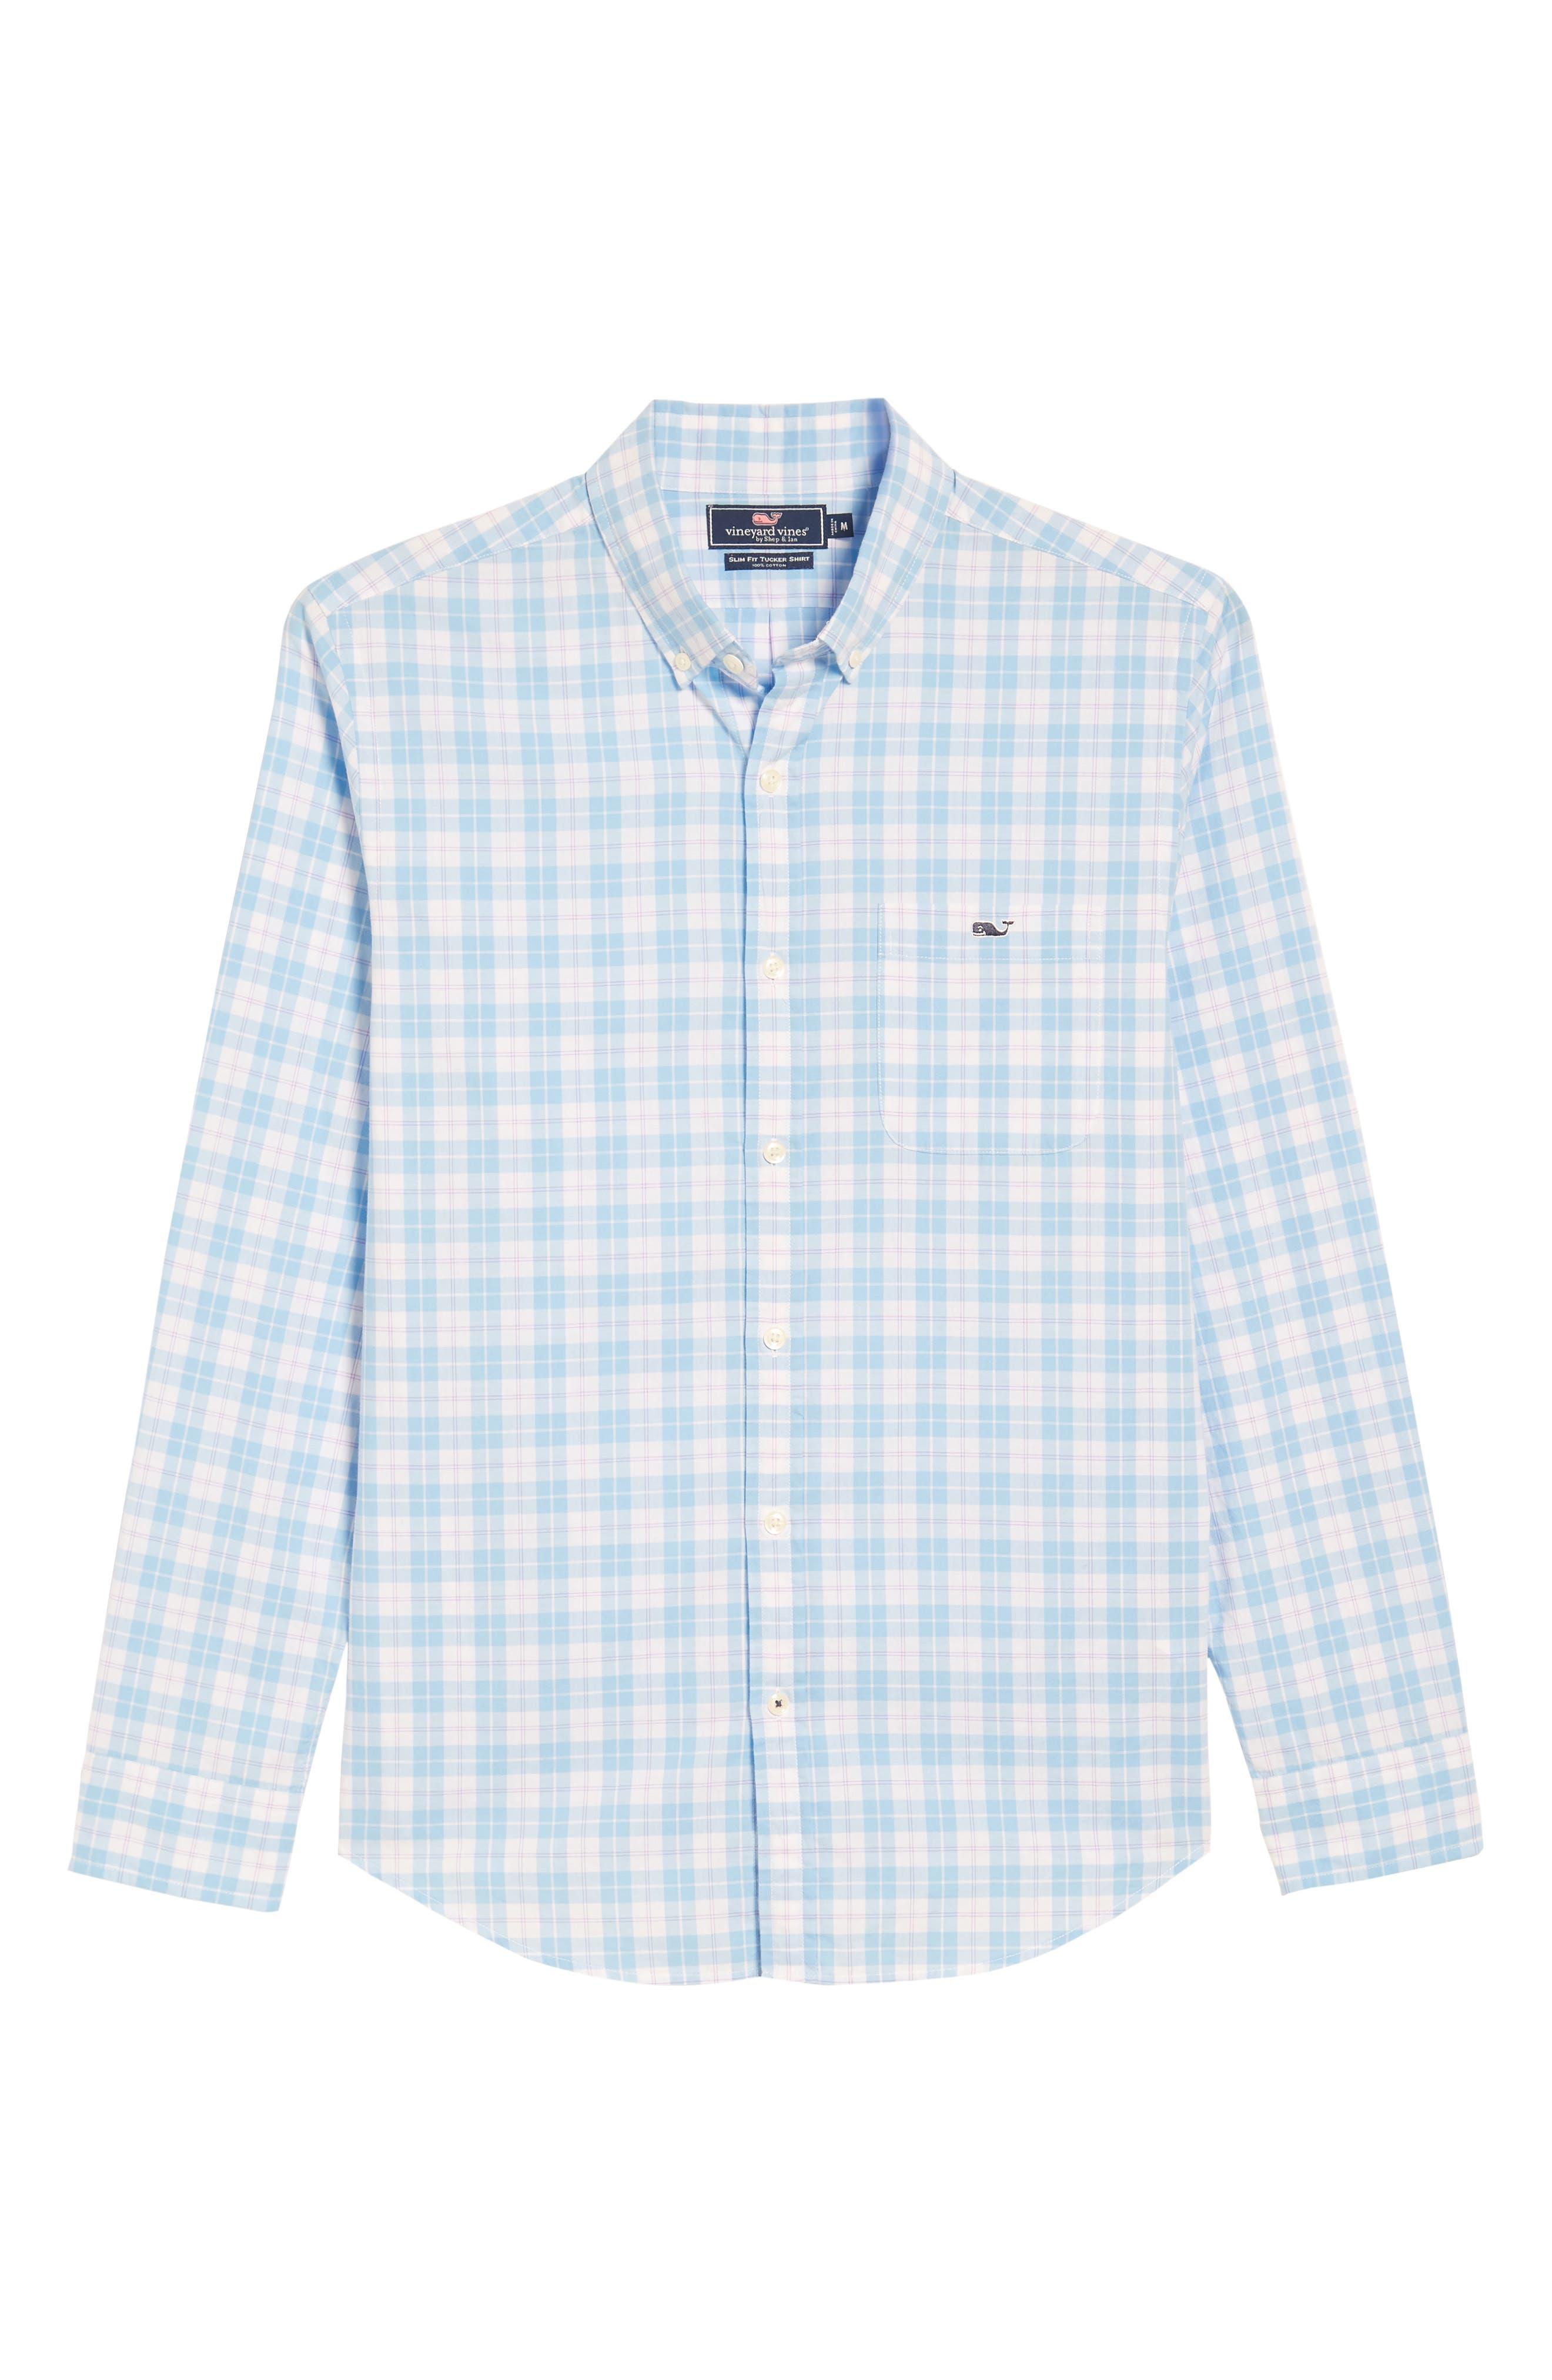 Shallow Sea Slim Fit Plaid Sport Shirt,                             Alternate thumbnail 6, color,                             Ocean Breeze